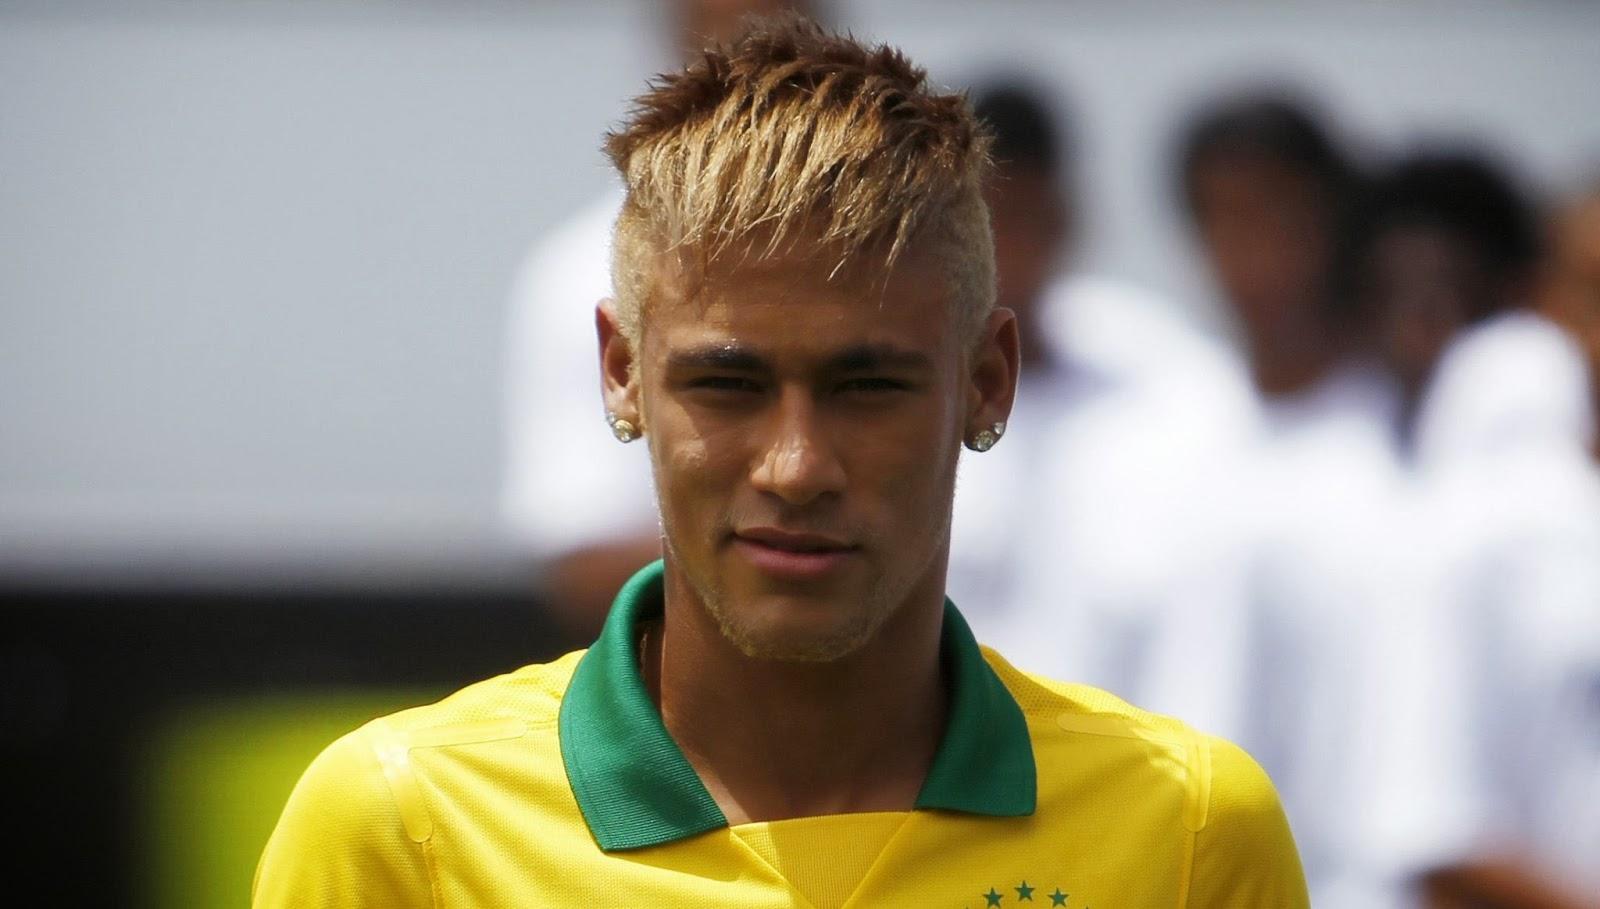 neymar - photo #25